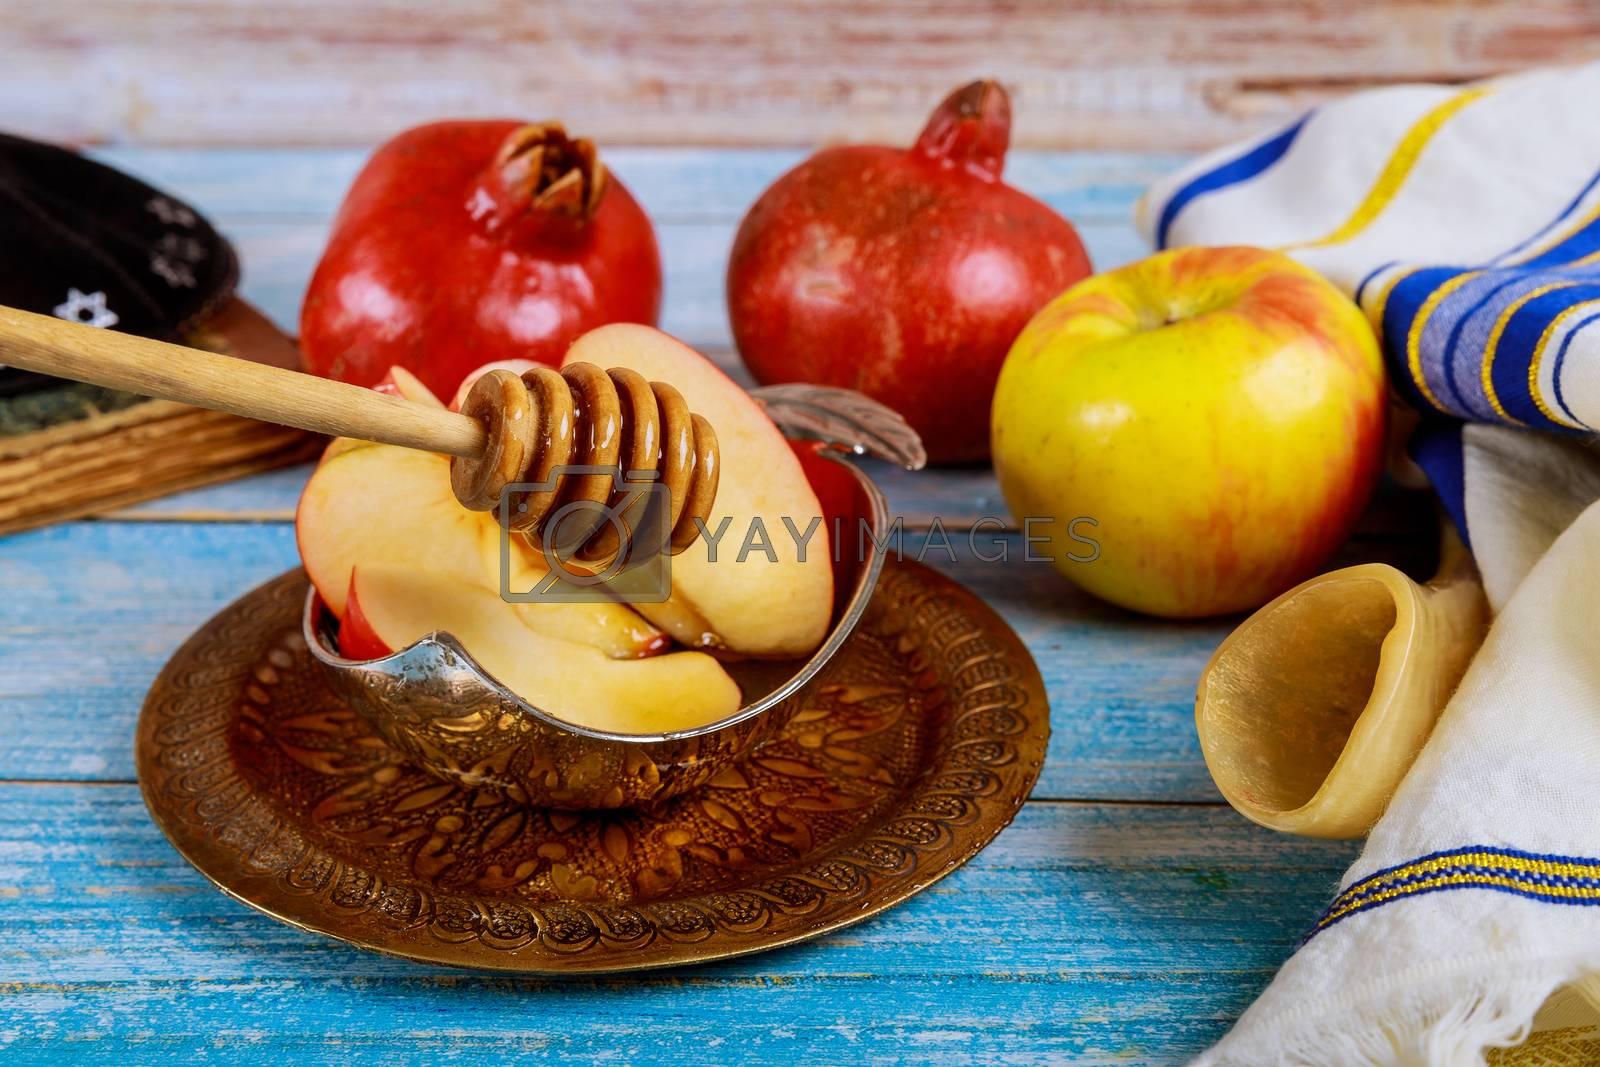 Orthodox Jewish holiday honey on the pomegranate and apples. Jewish new year Rosh HaShana shofar